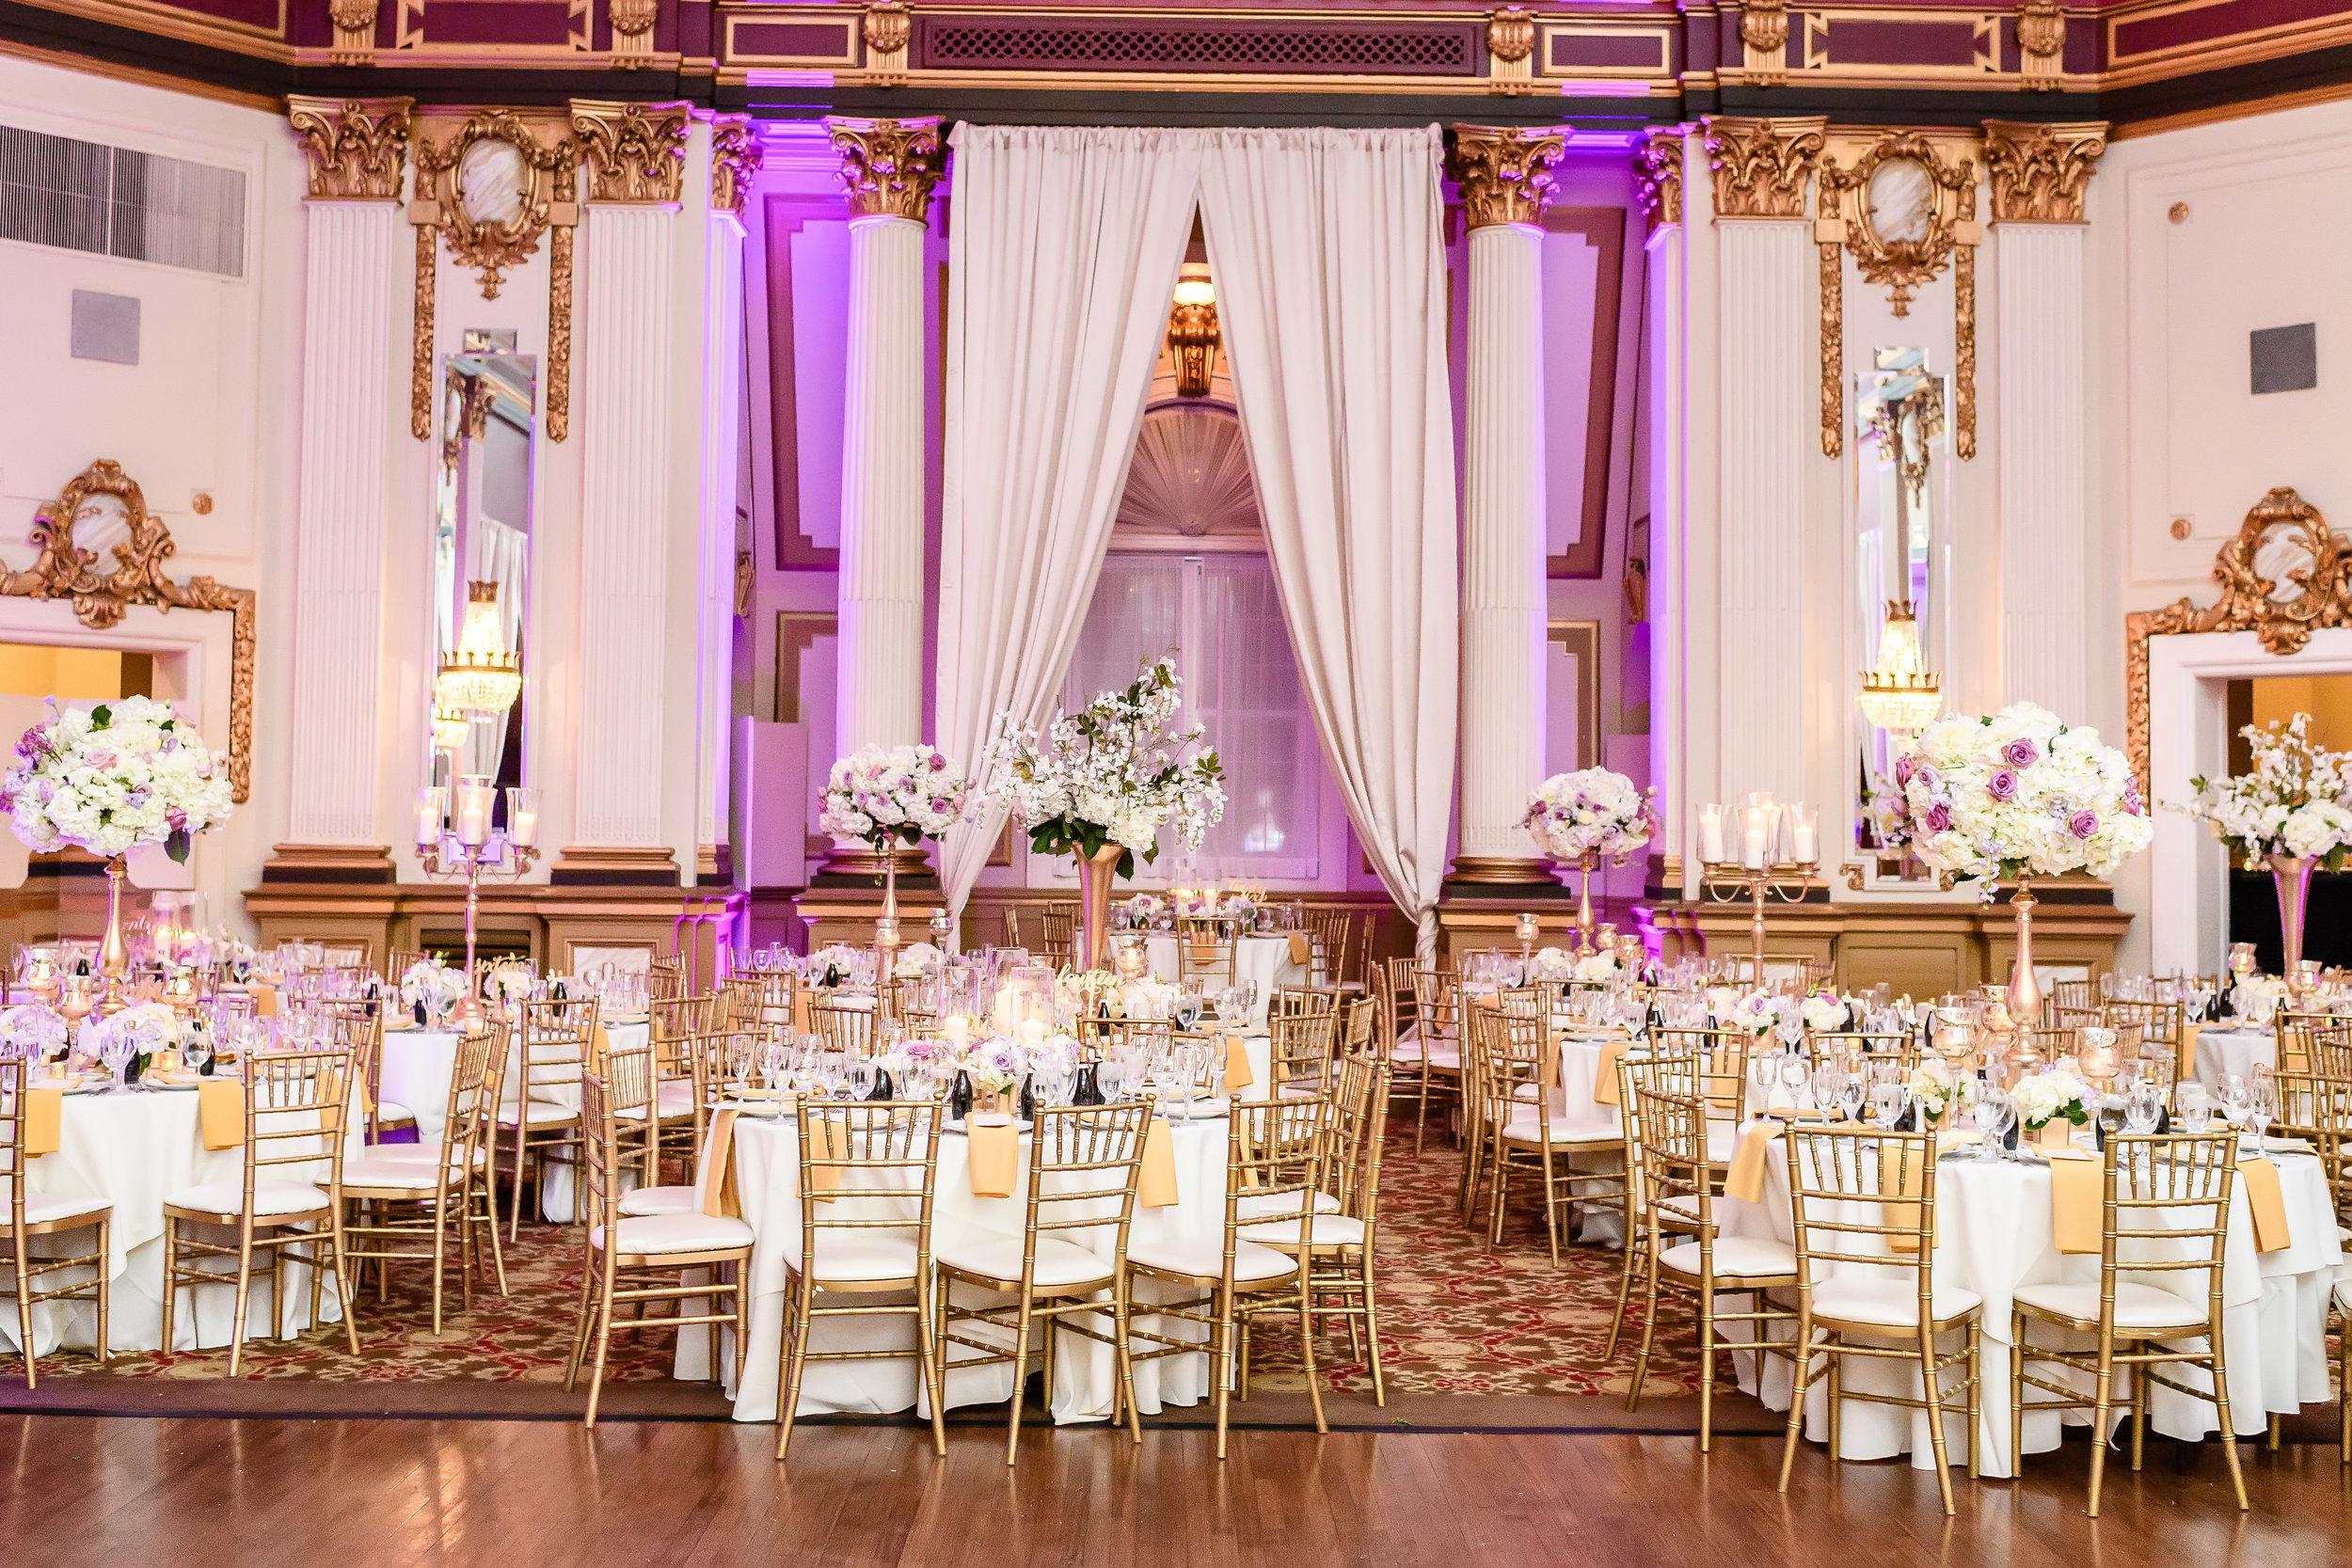 Imani_Kevin_NYE_Wedding_Belvedere_Hotel_Baltimore_MD_Reception-0005.jpg